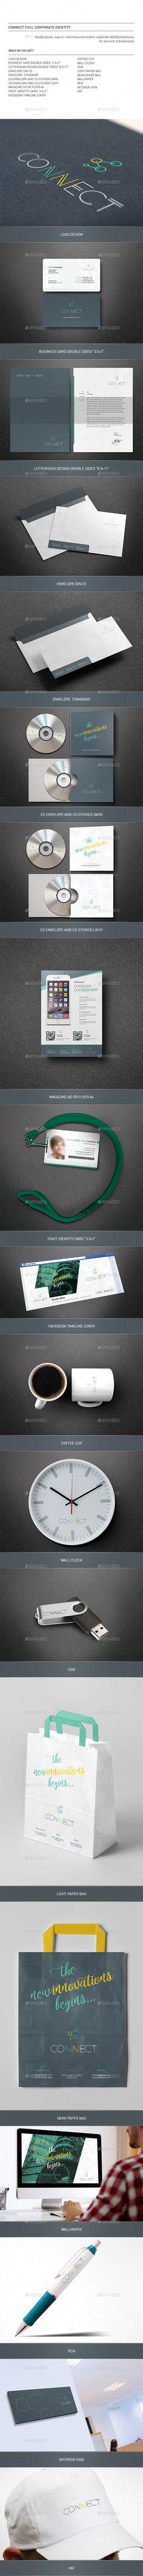 Web Design Corporate Identity | Corporate identity, Stationery ...